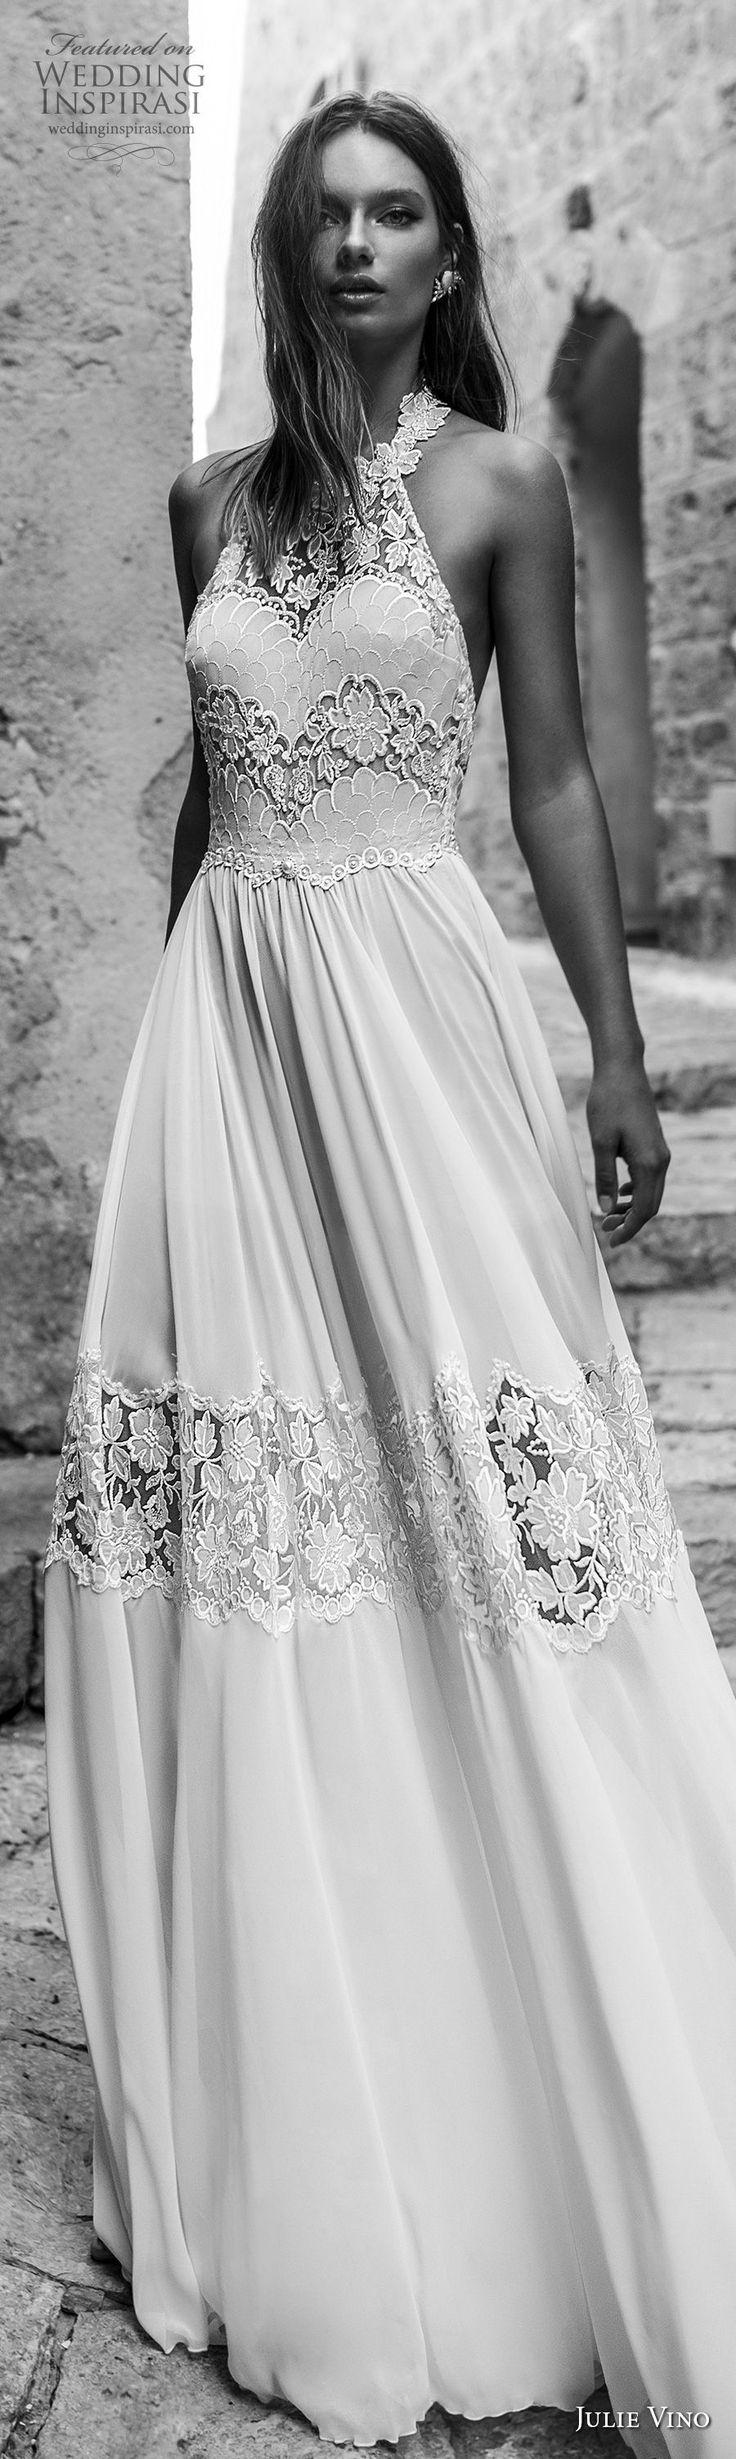 julie vino 2018 bridal sleeveless illusion halter sweetheart neck heavily embellished bodice roamtic soft a  line wedding dress open back chapel train (53) lv -- Romanzo by Julie Vino 2018 Wedding Dresses